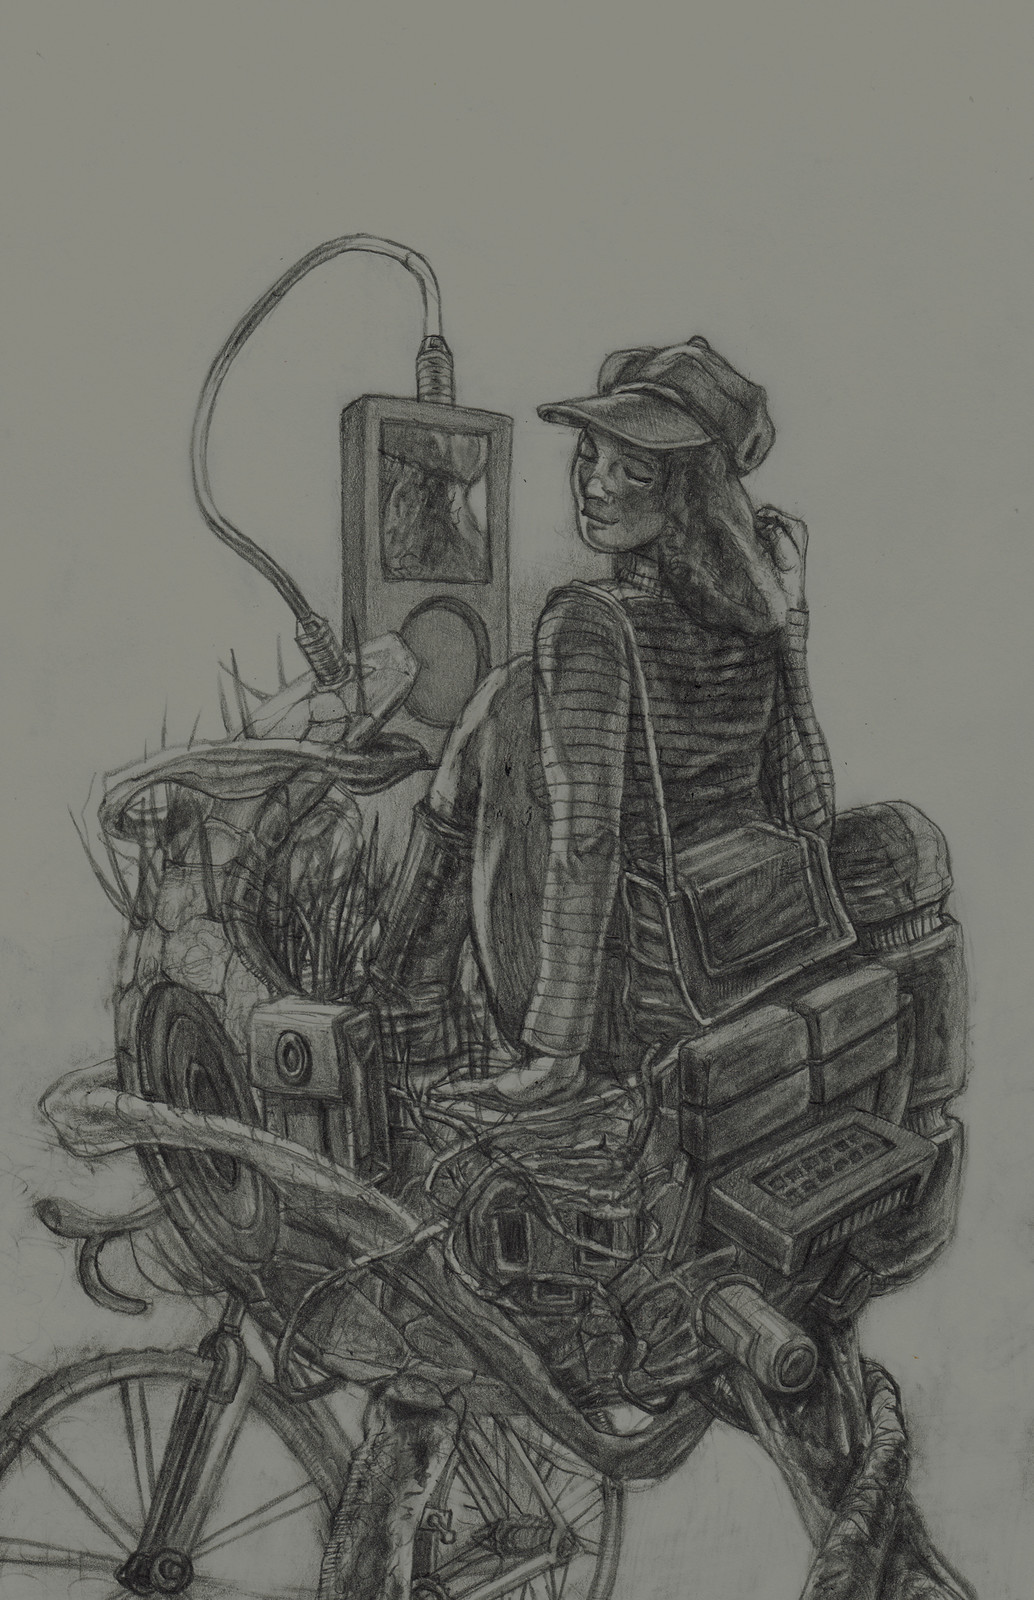 Sally Surreal #2 Sketch